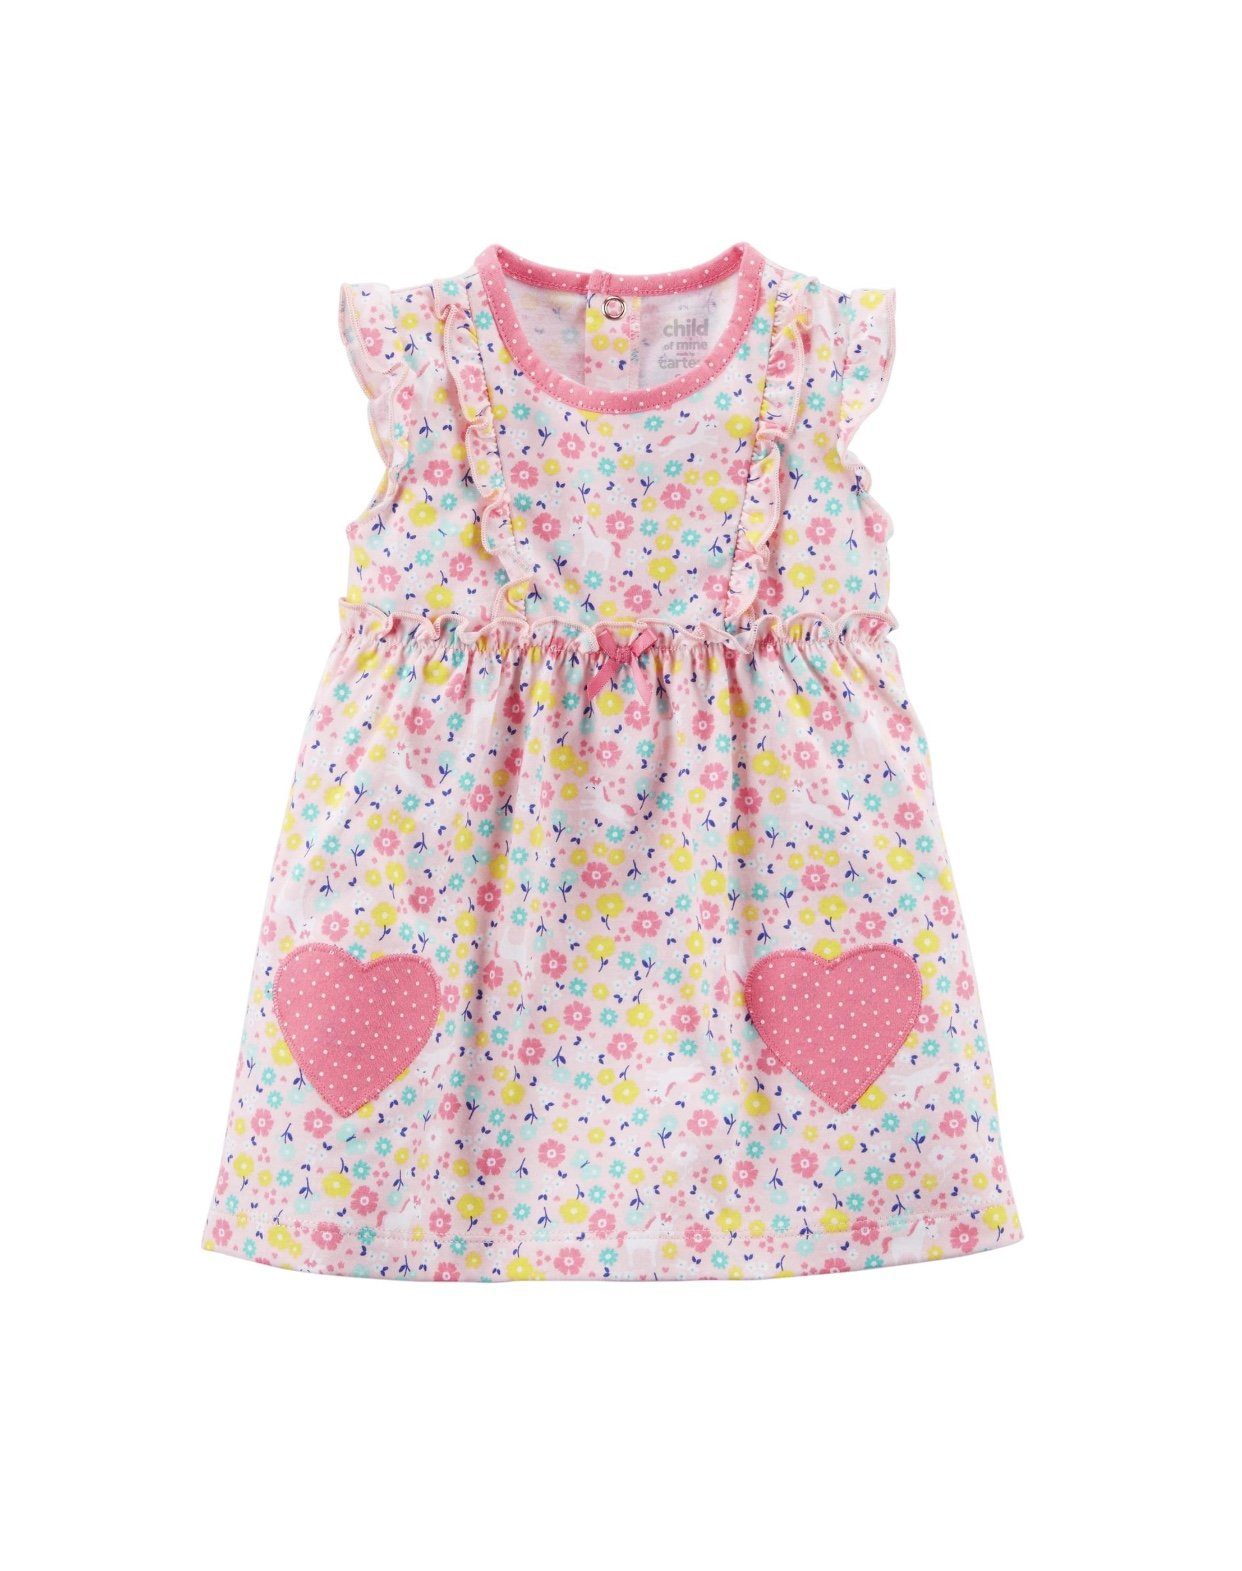 NWT Child Mine,Carters Baby Girl BODYSUIT 3p Set UNICORN Navy Blue//Pink Rainbow